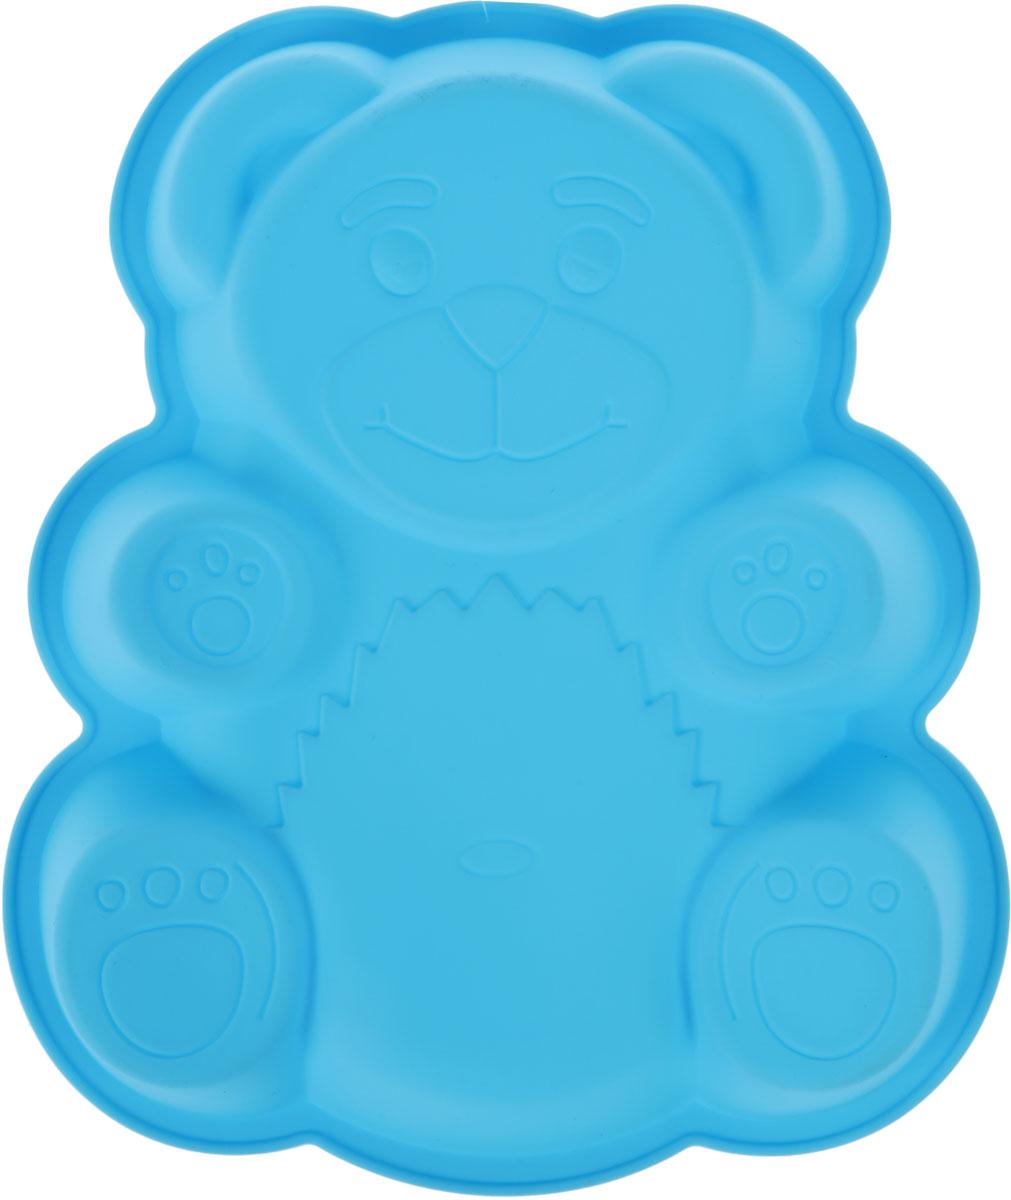 Форма для выпечки Доляна Мишка, цвет: голубой, 32 х 26,5 х 4 см1057075_голубойФорма для выпечки Доляна Мишка, цвет: голубой, 32 х 26,5 х 4 см